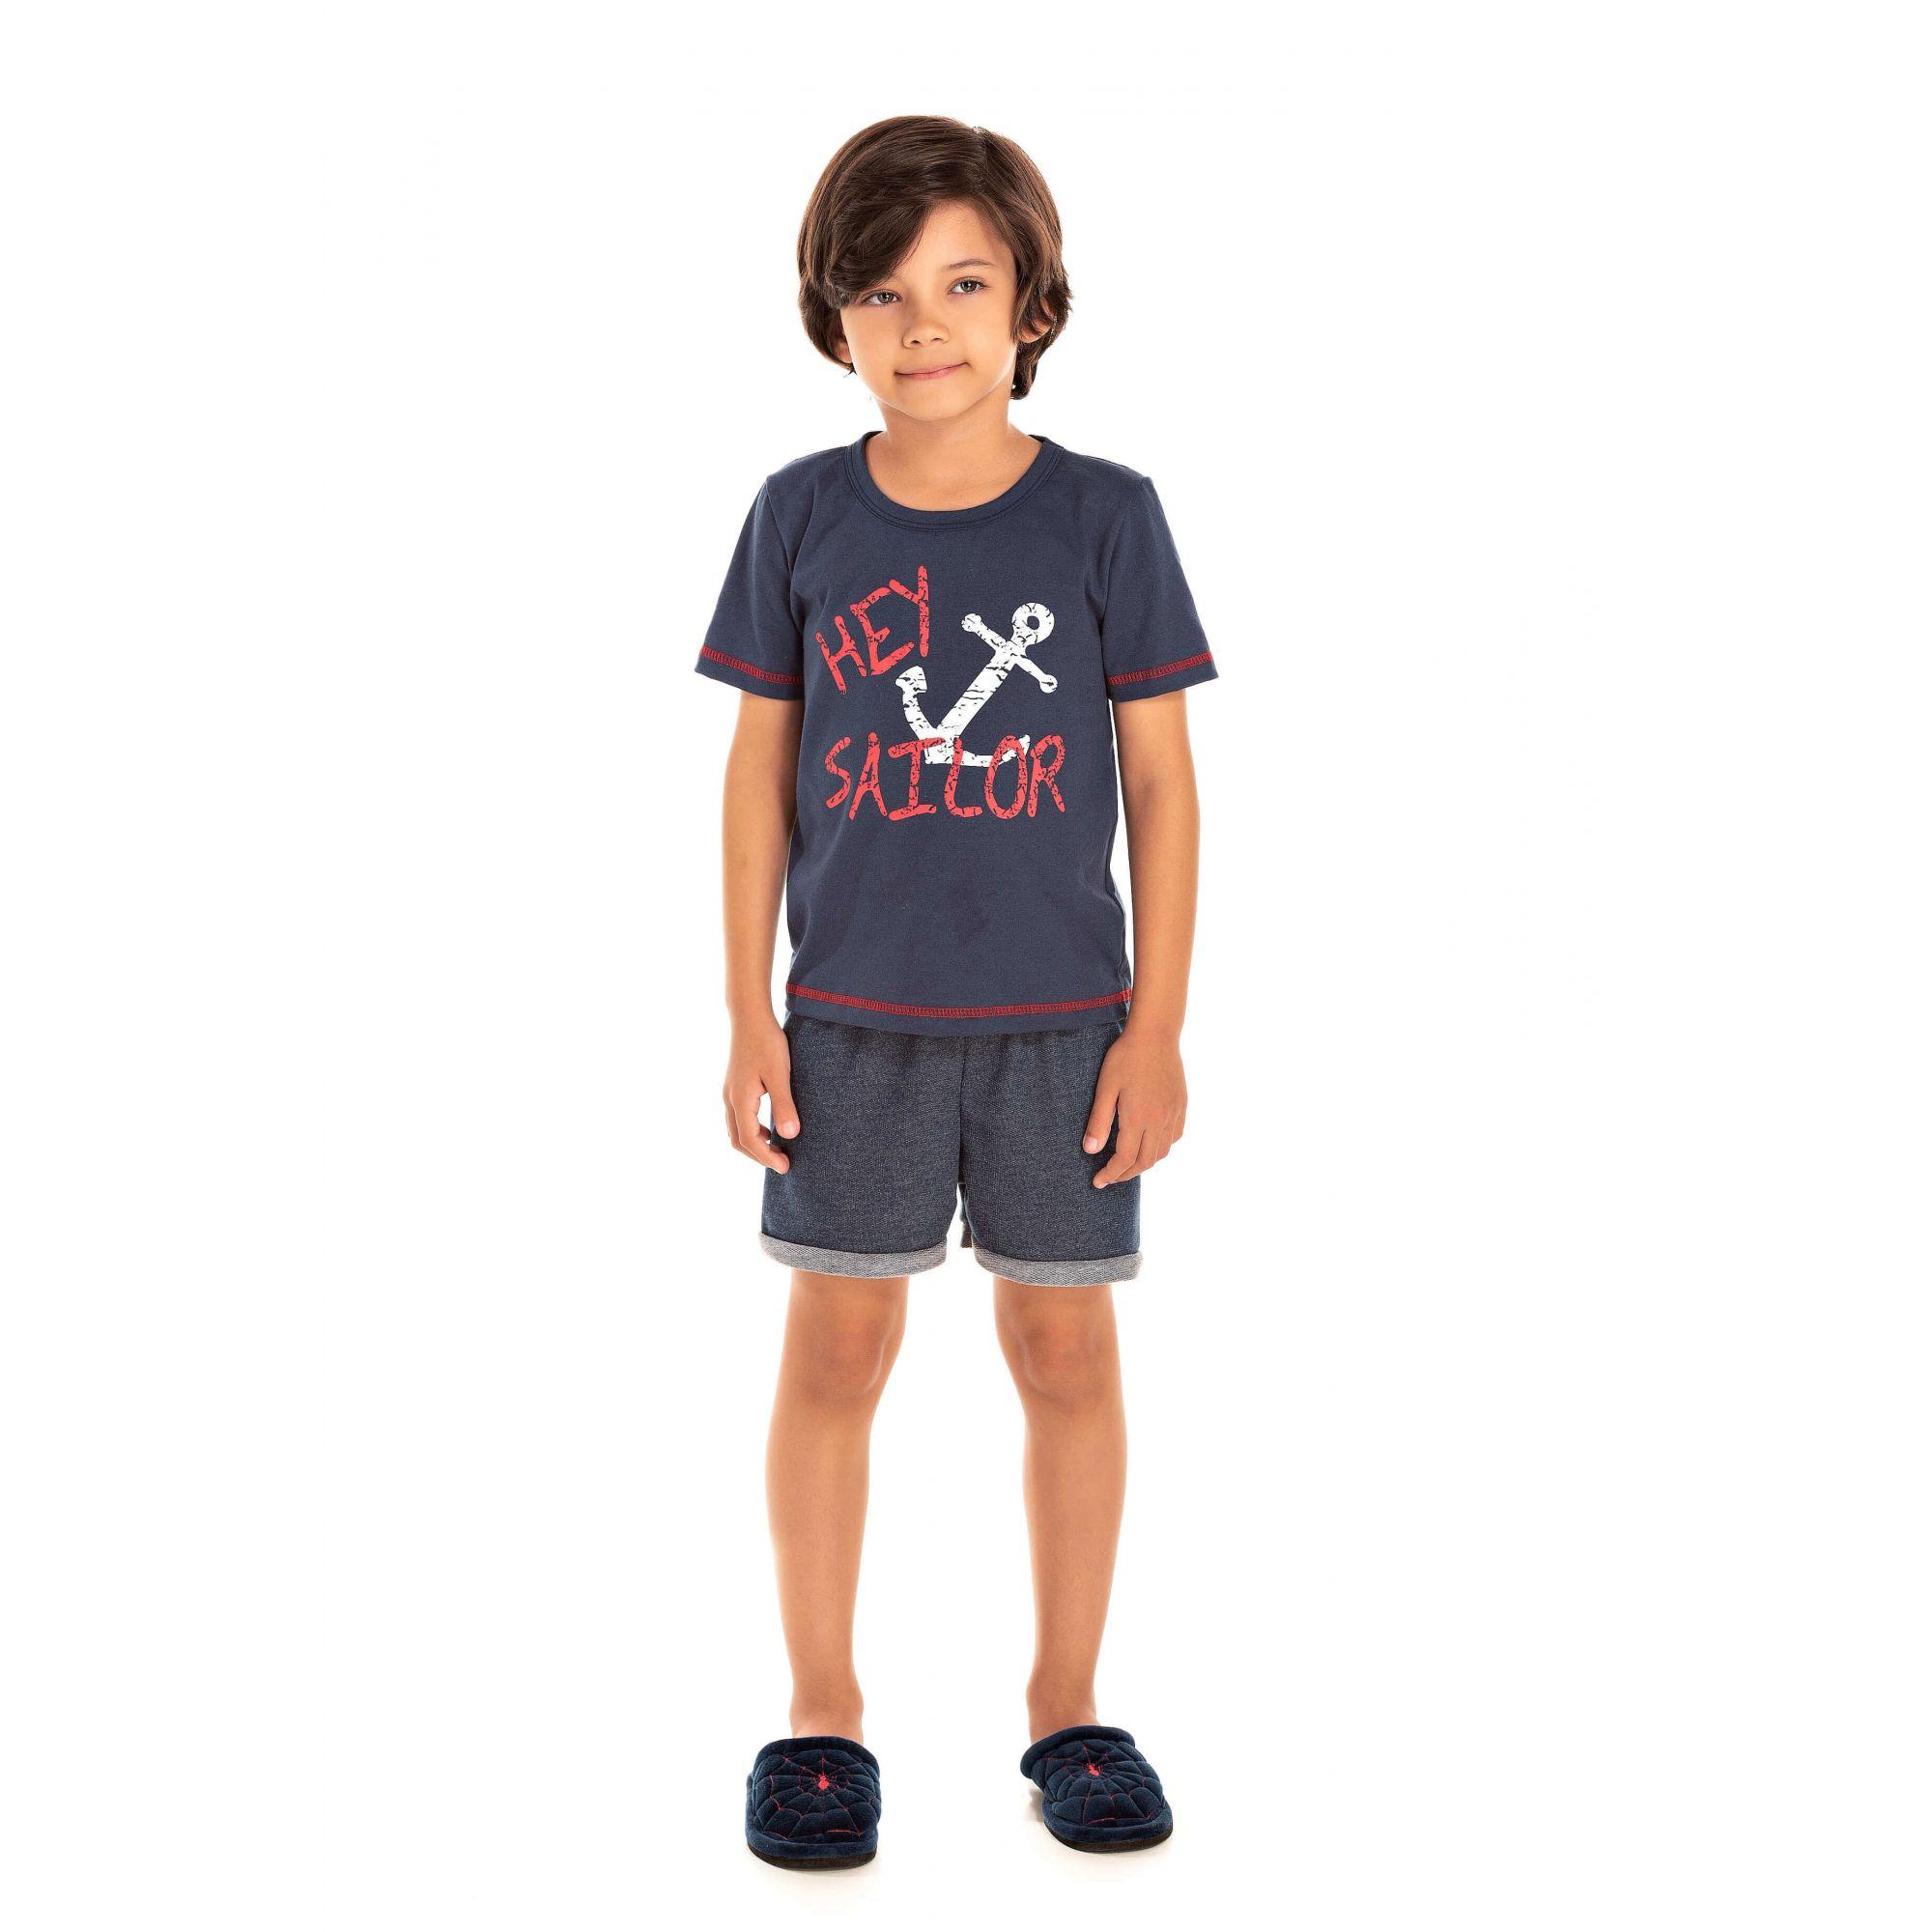 107/E - Pijama Infantil Masculino Hey Sailor -  Marinho